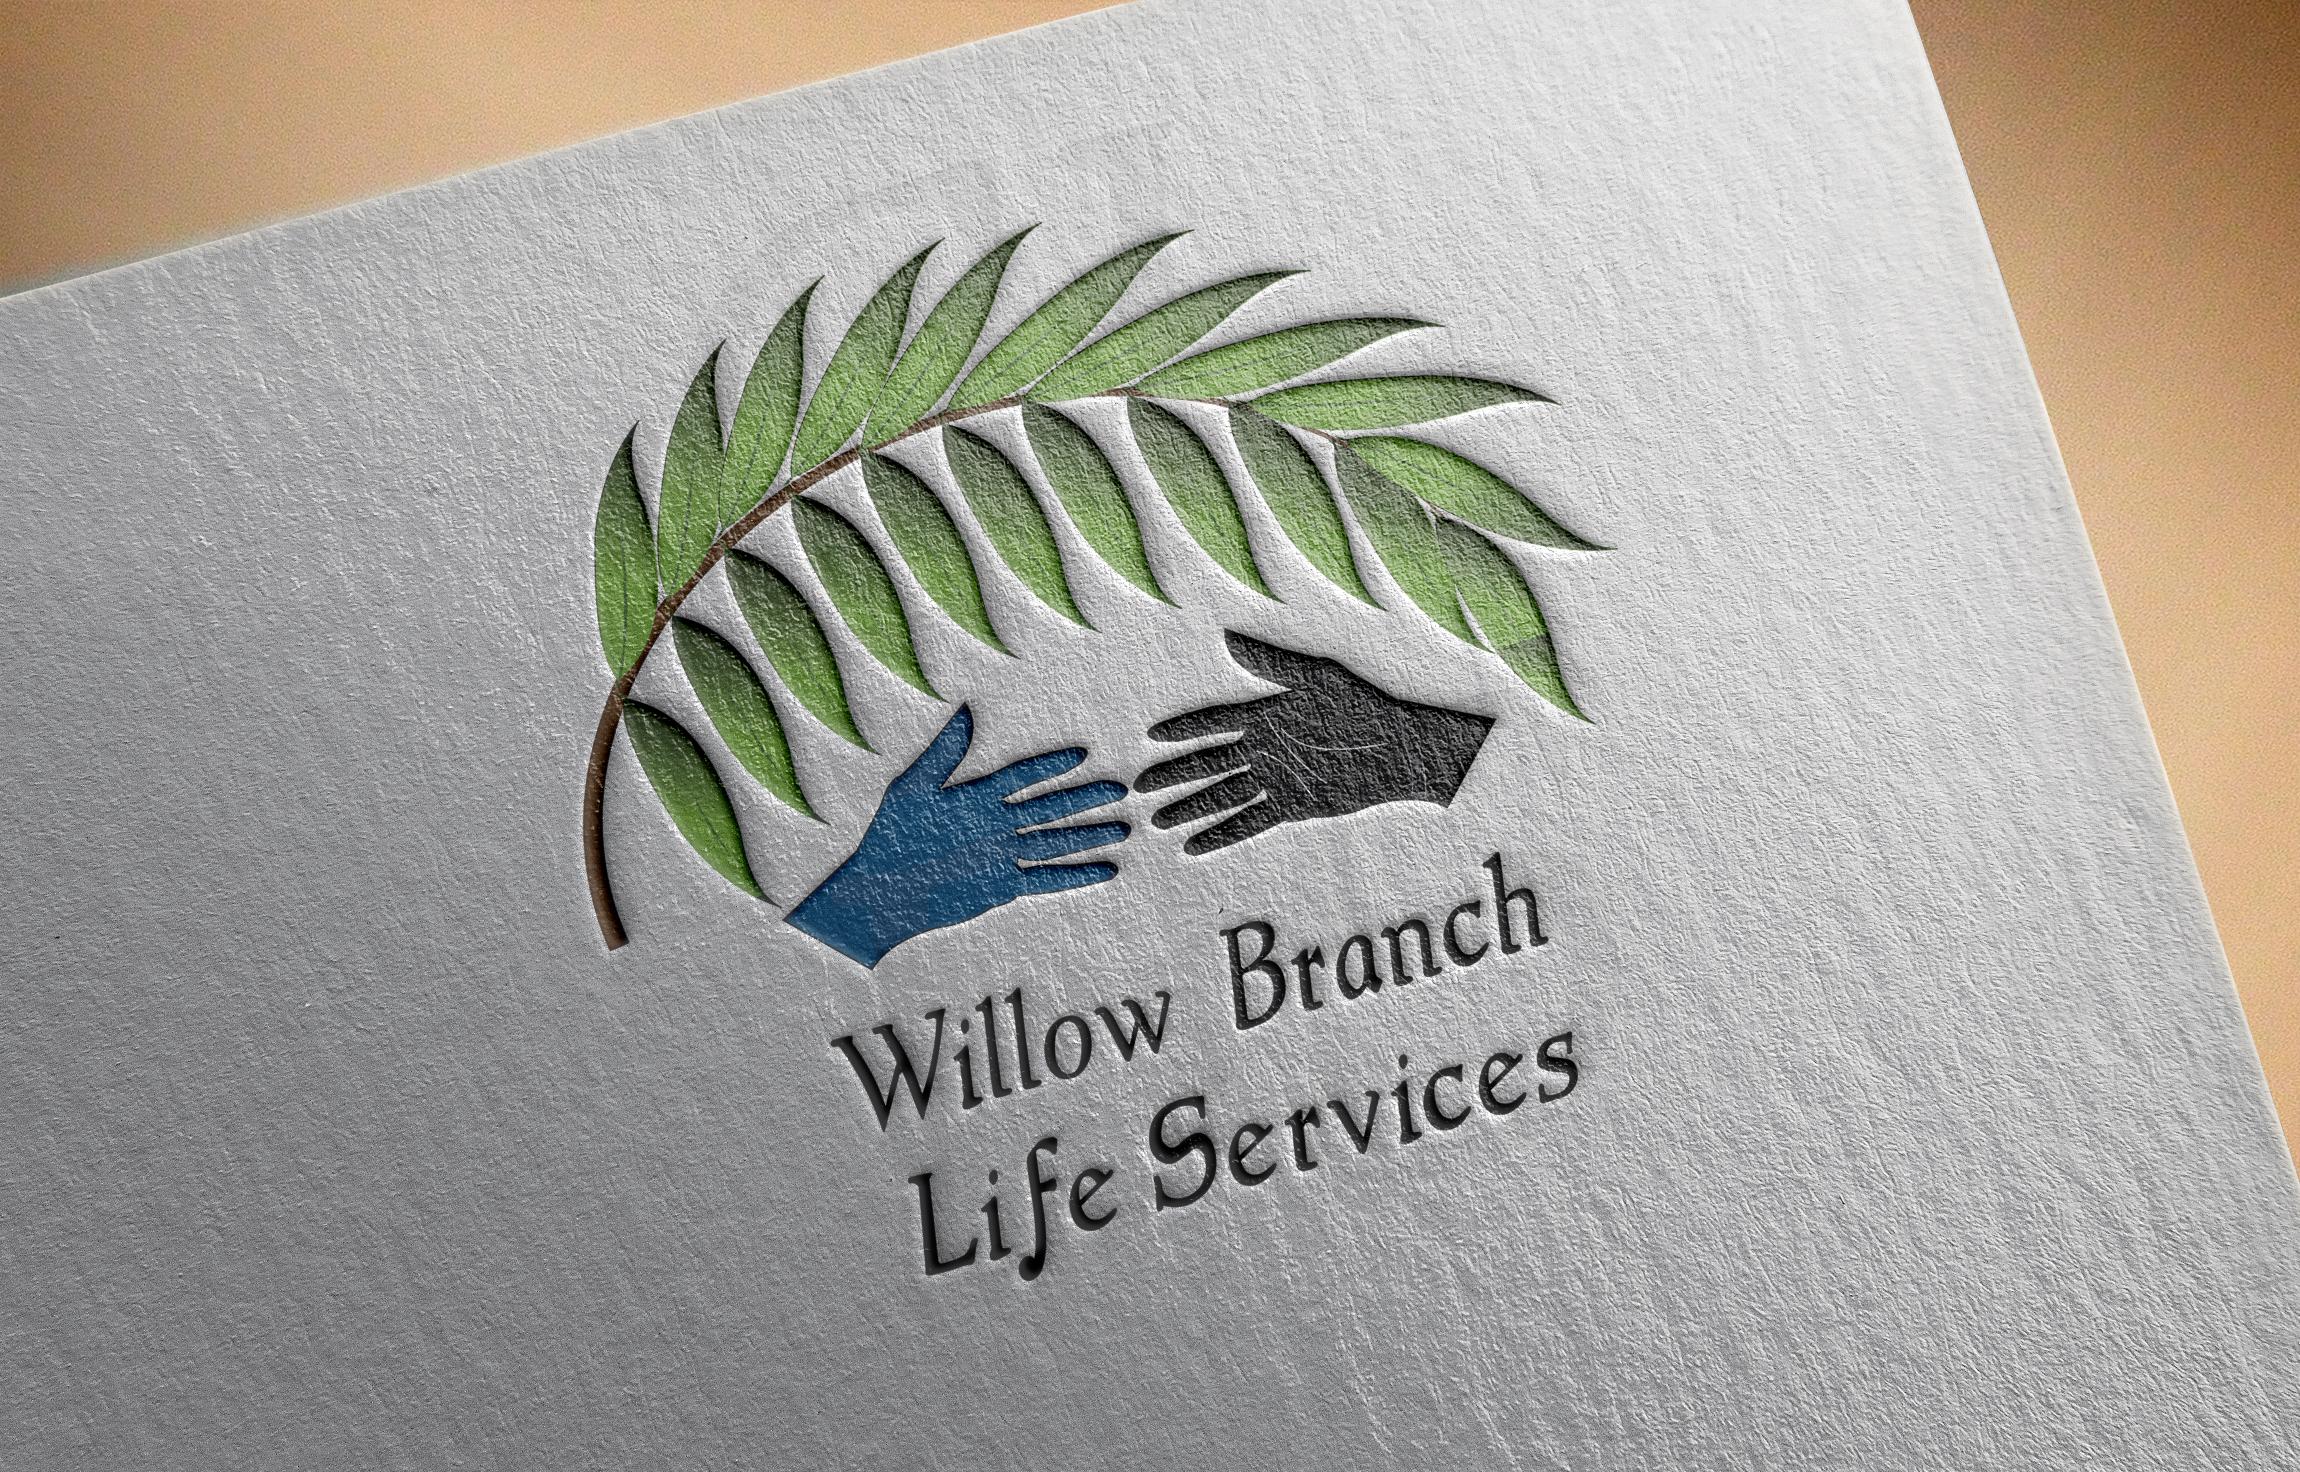 Logo Design by Goran Ledjenovic - Entry No. 224 in the Logo Design Contest Artistic Logo Design for Willow Branch Life Service.